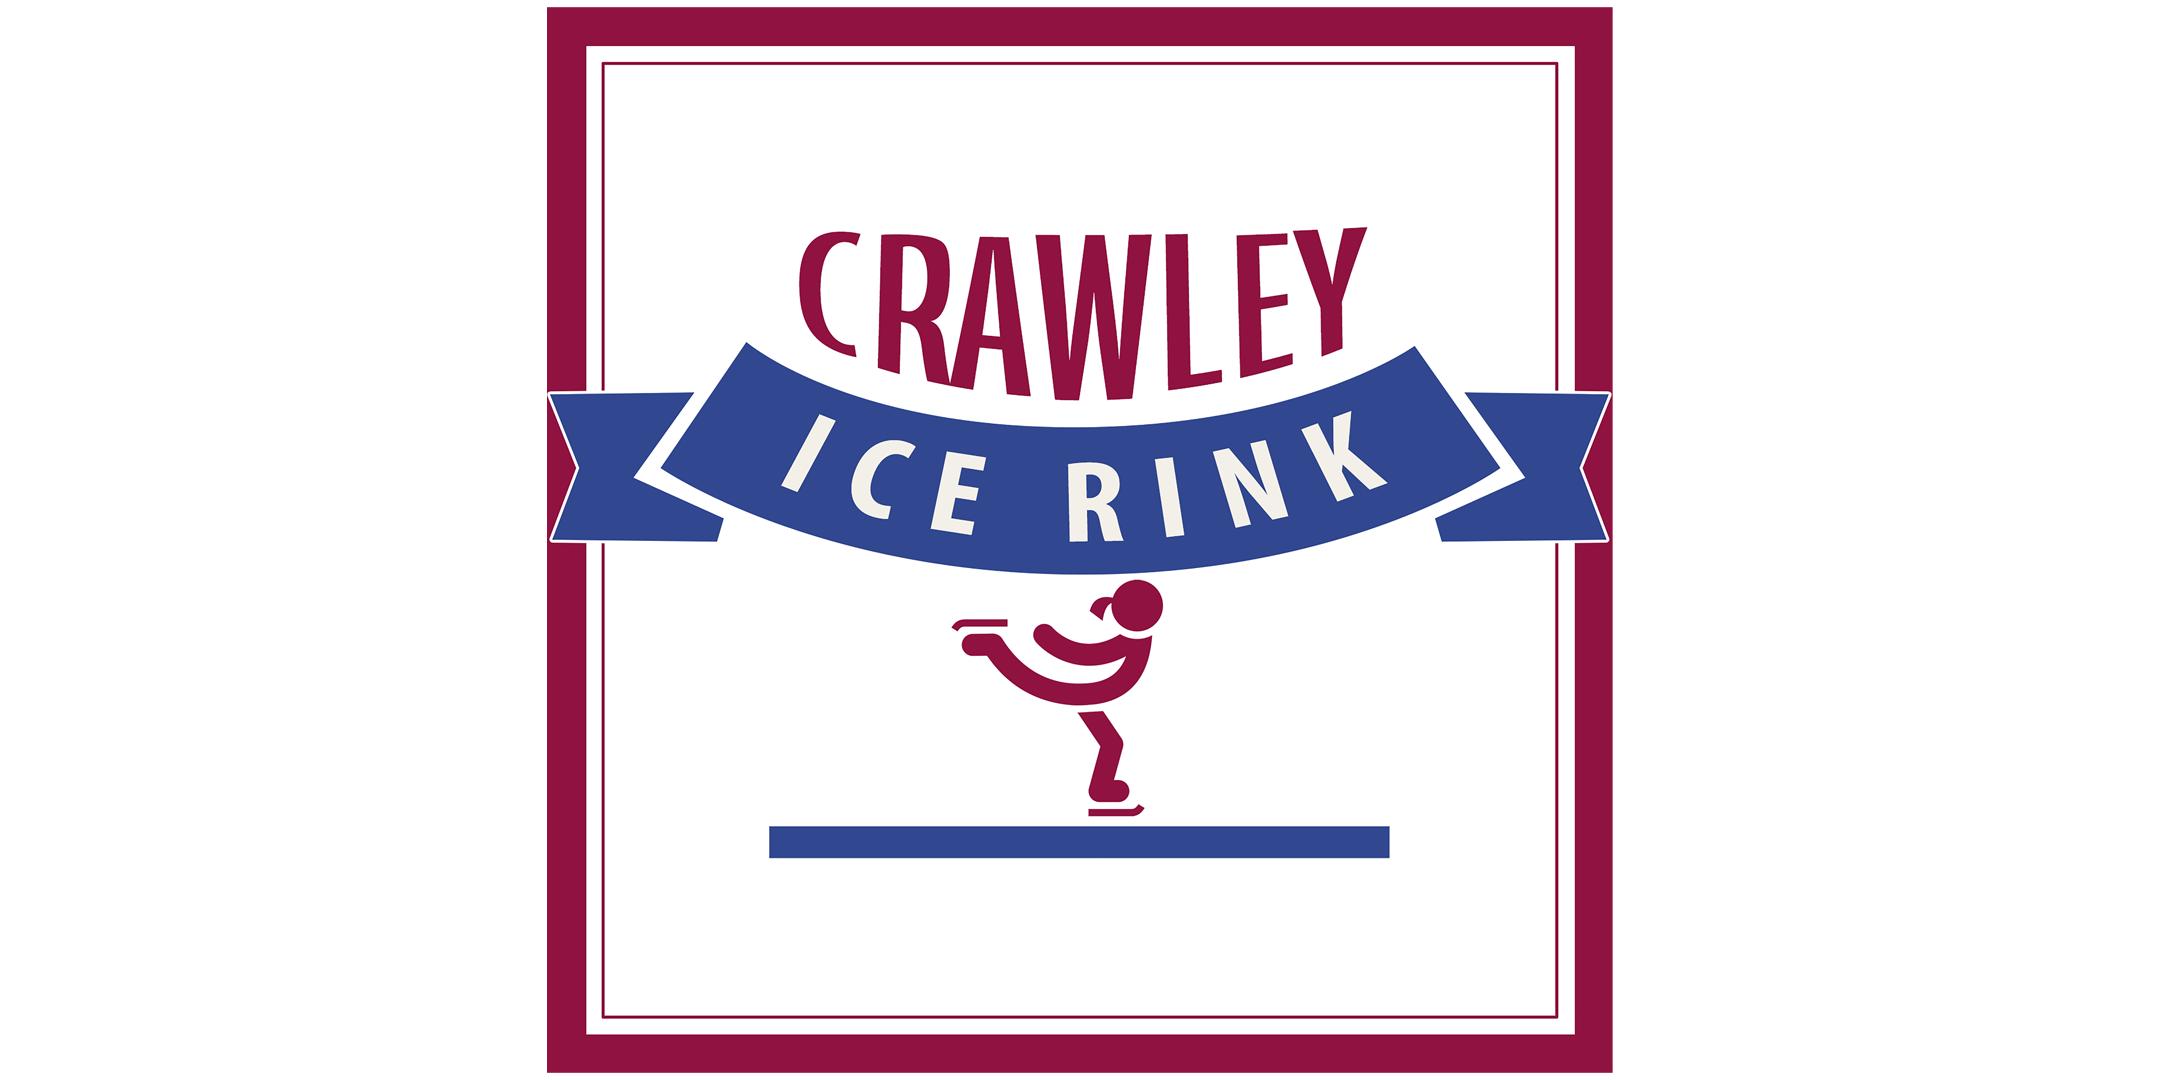 Crawley Ice Rink - 1st January (Peak)